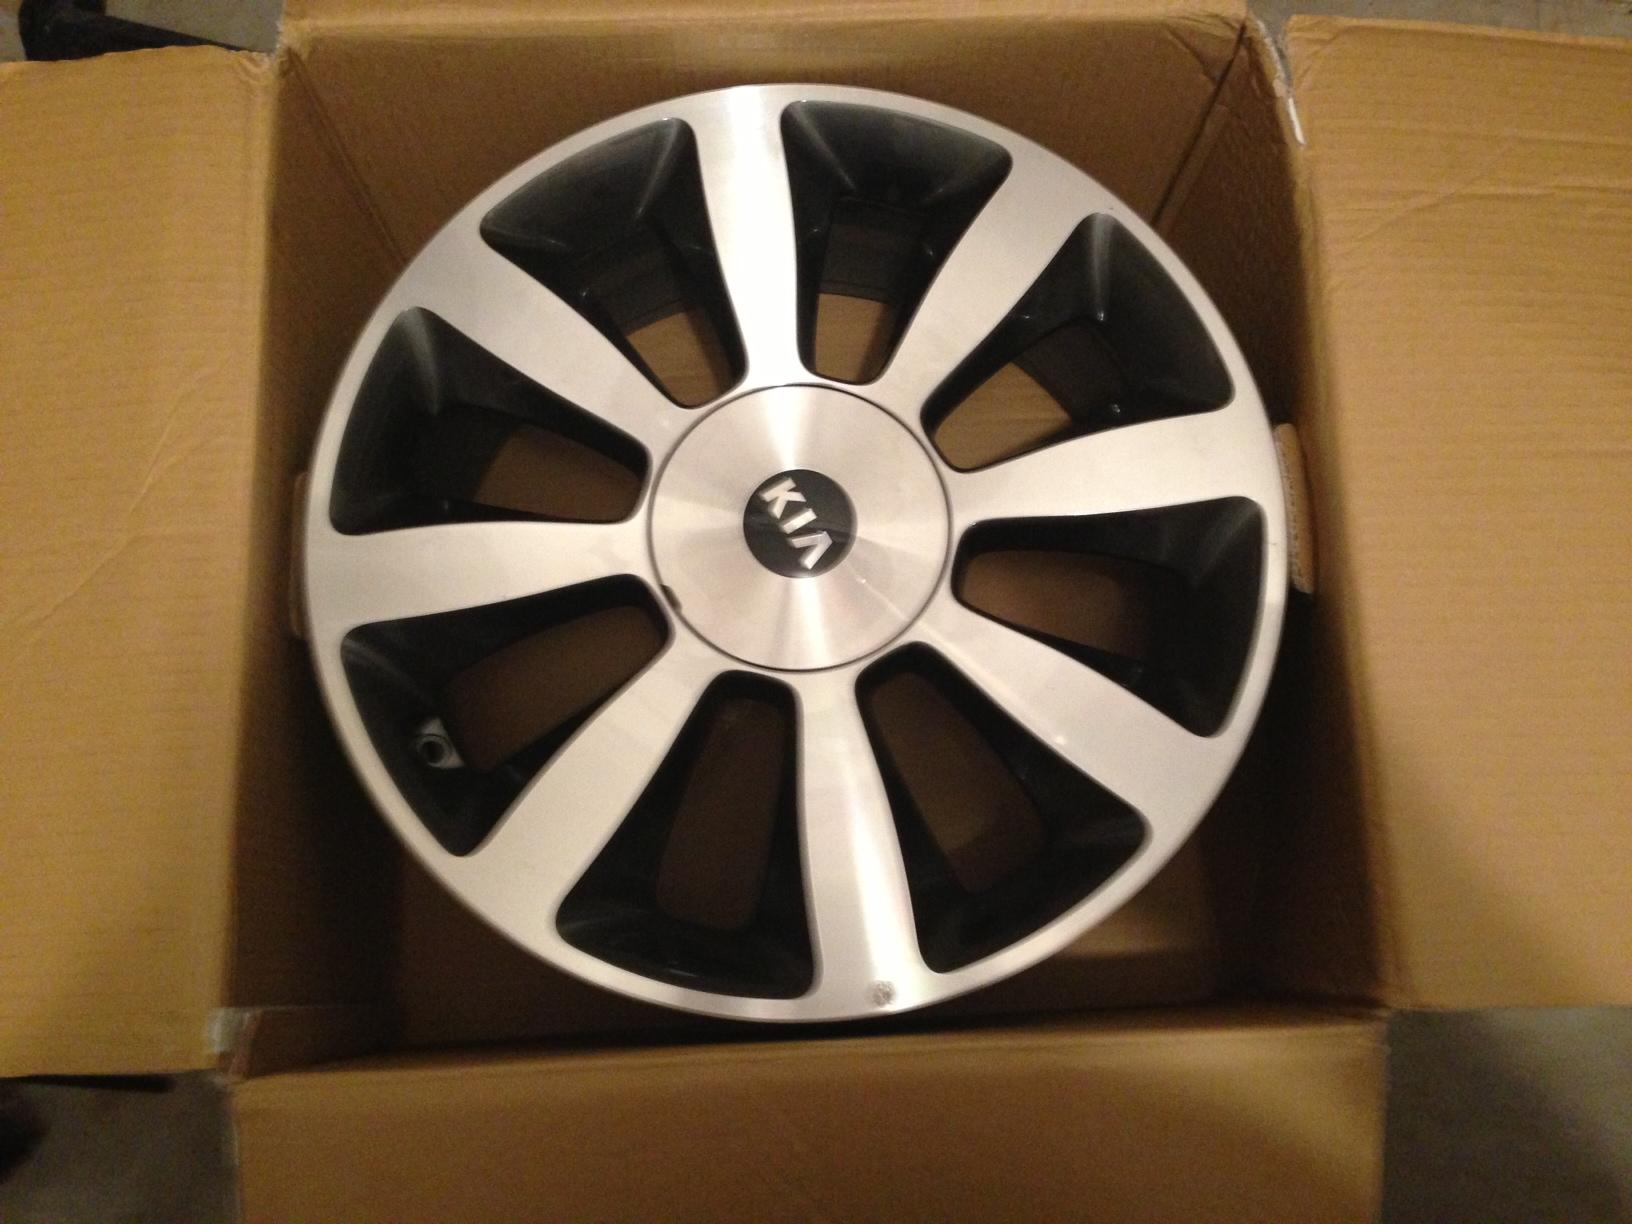 [FS] : SOLD Luxury Wheels from 2013 Optima SX w/ Premium ...